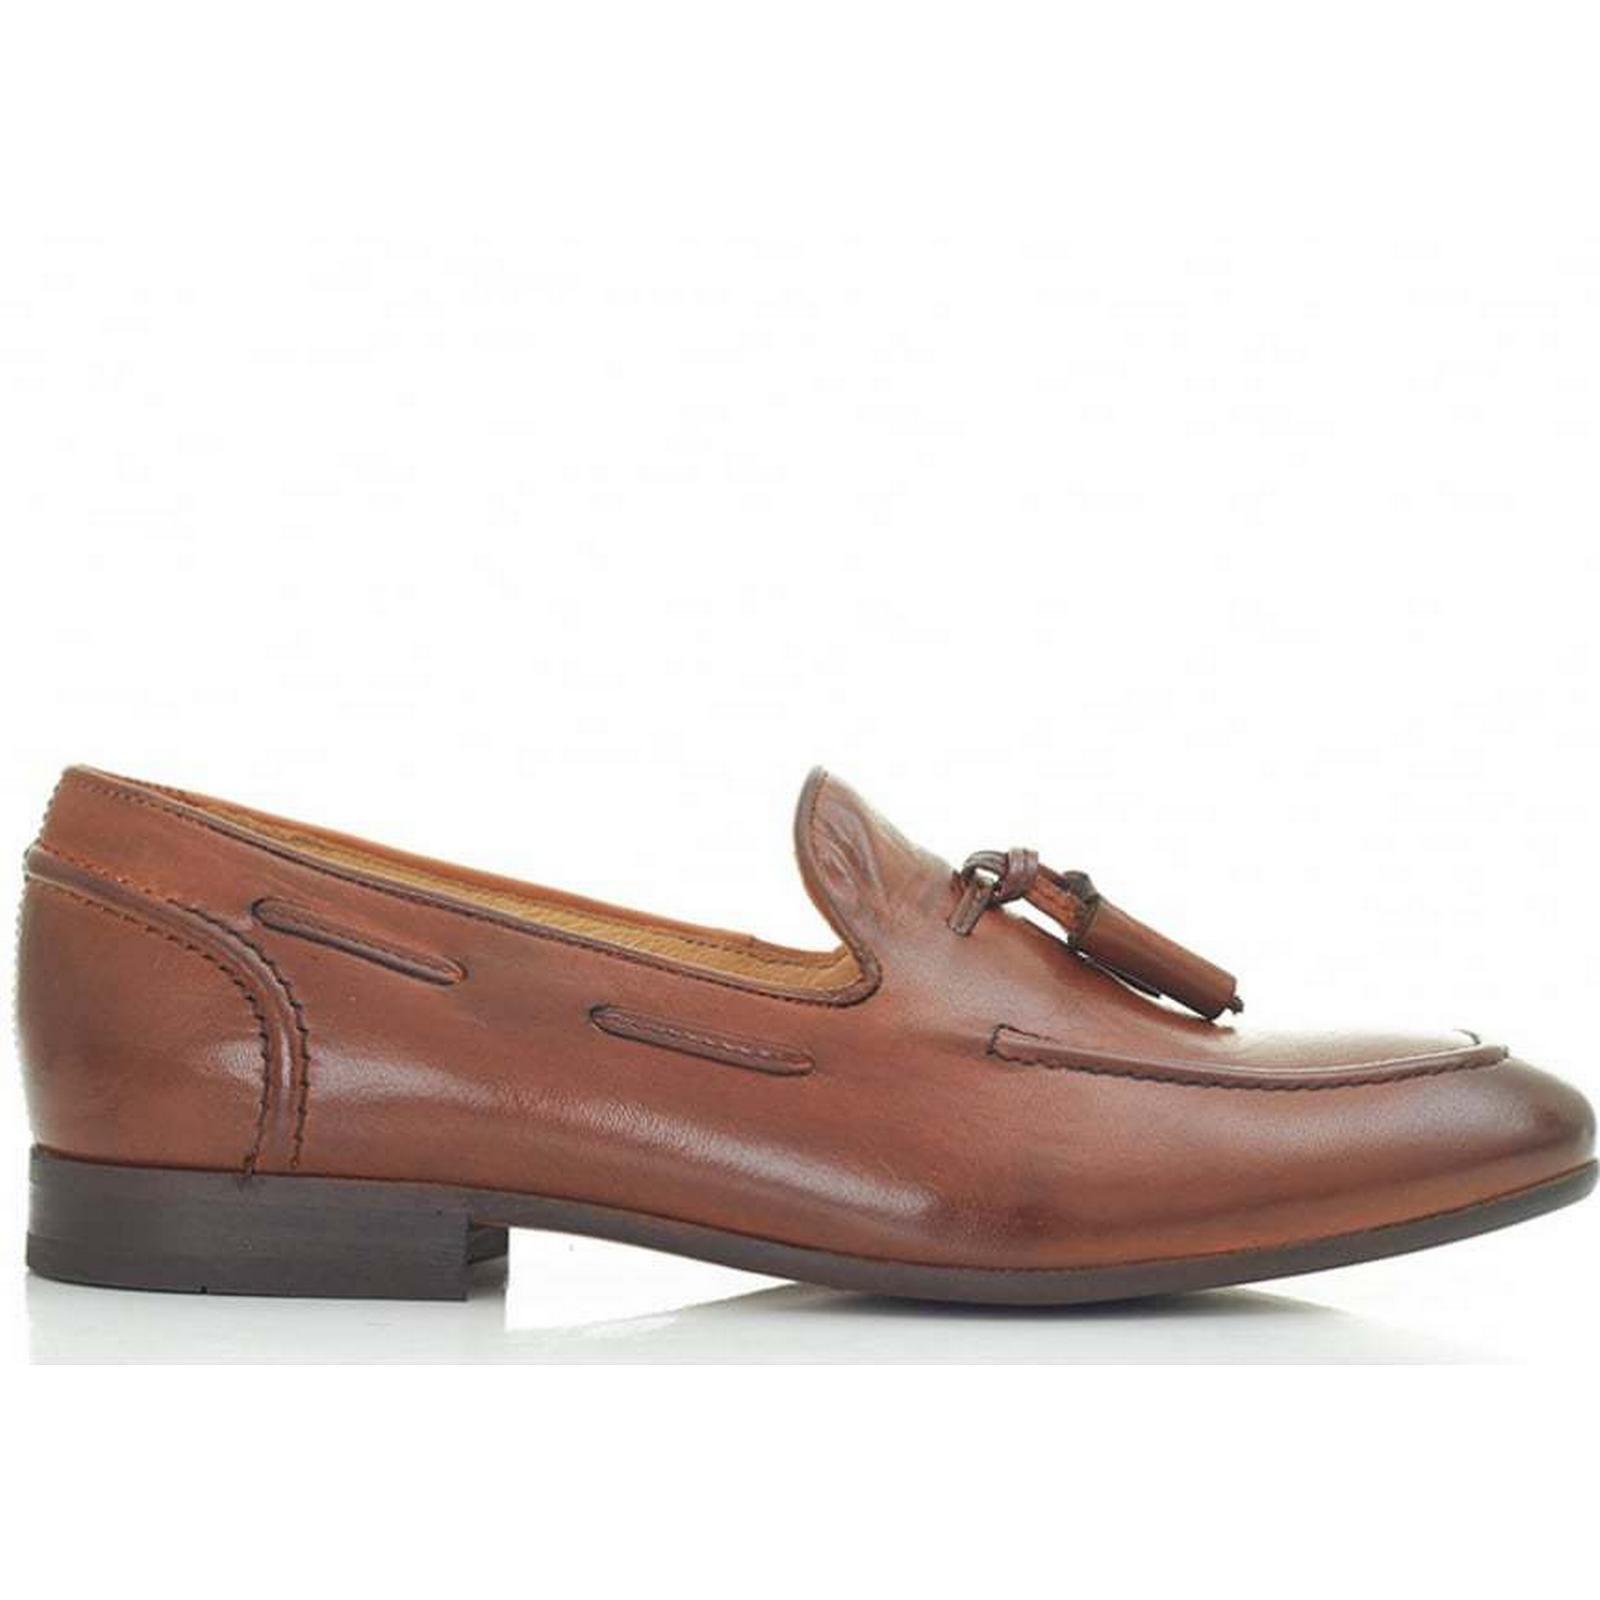 H By Hudson Pierre Tan, Tassel Loafers Colour: Calf Tan, Pierre Size: 9 49e12b